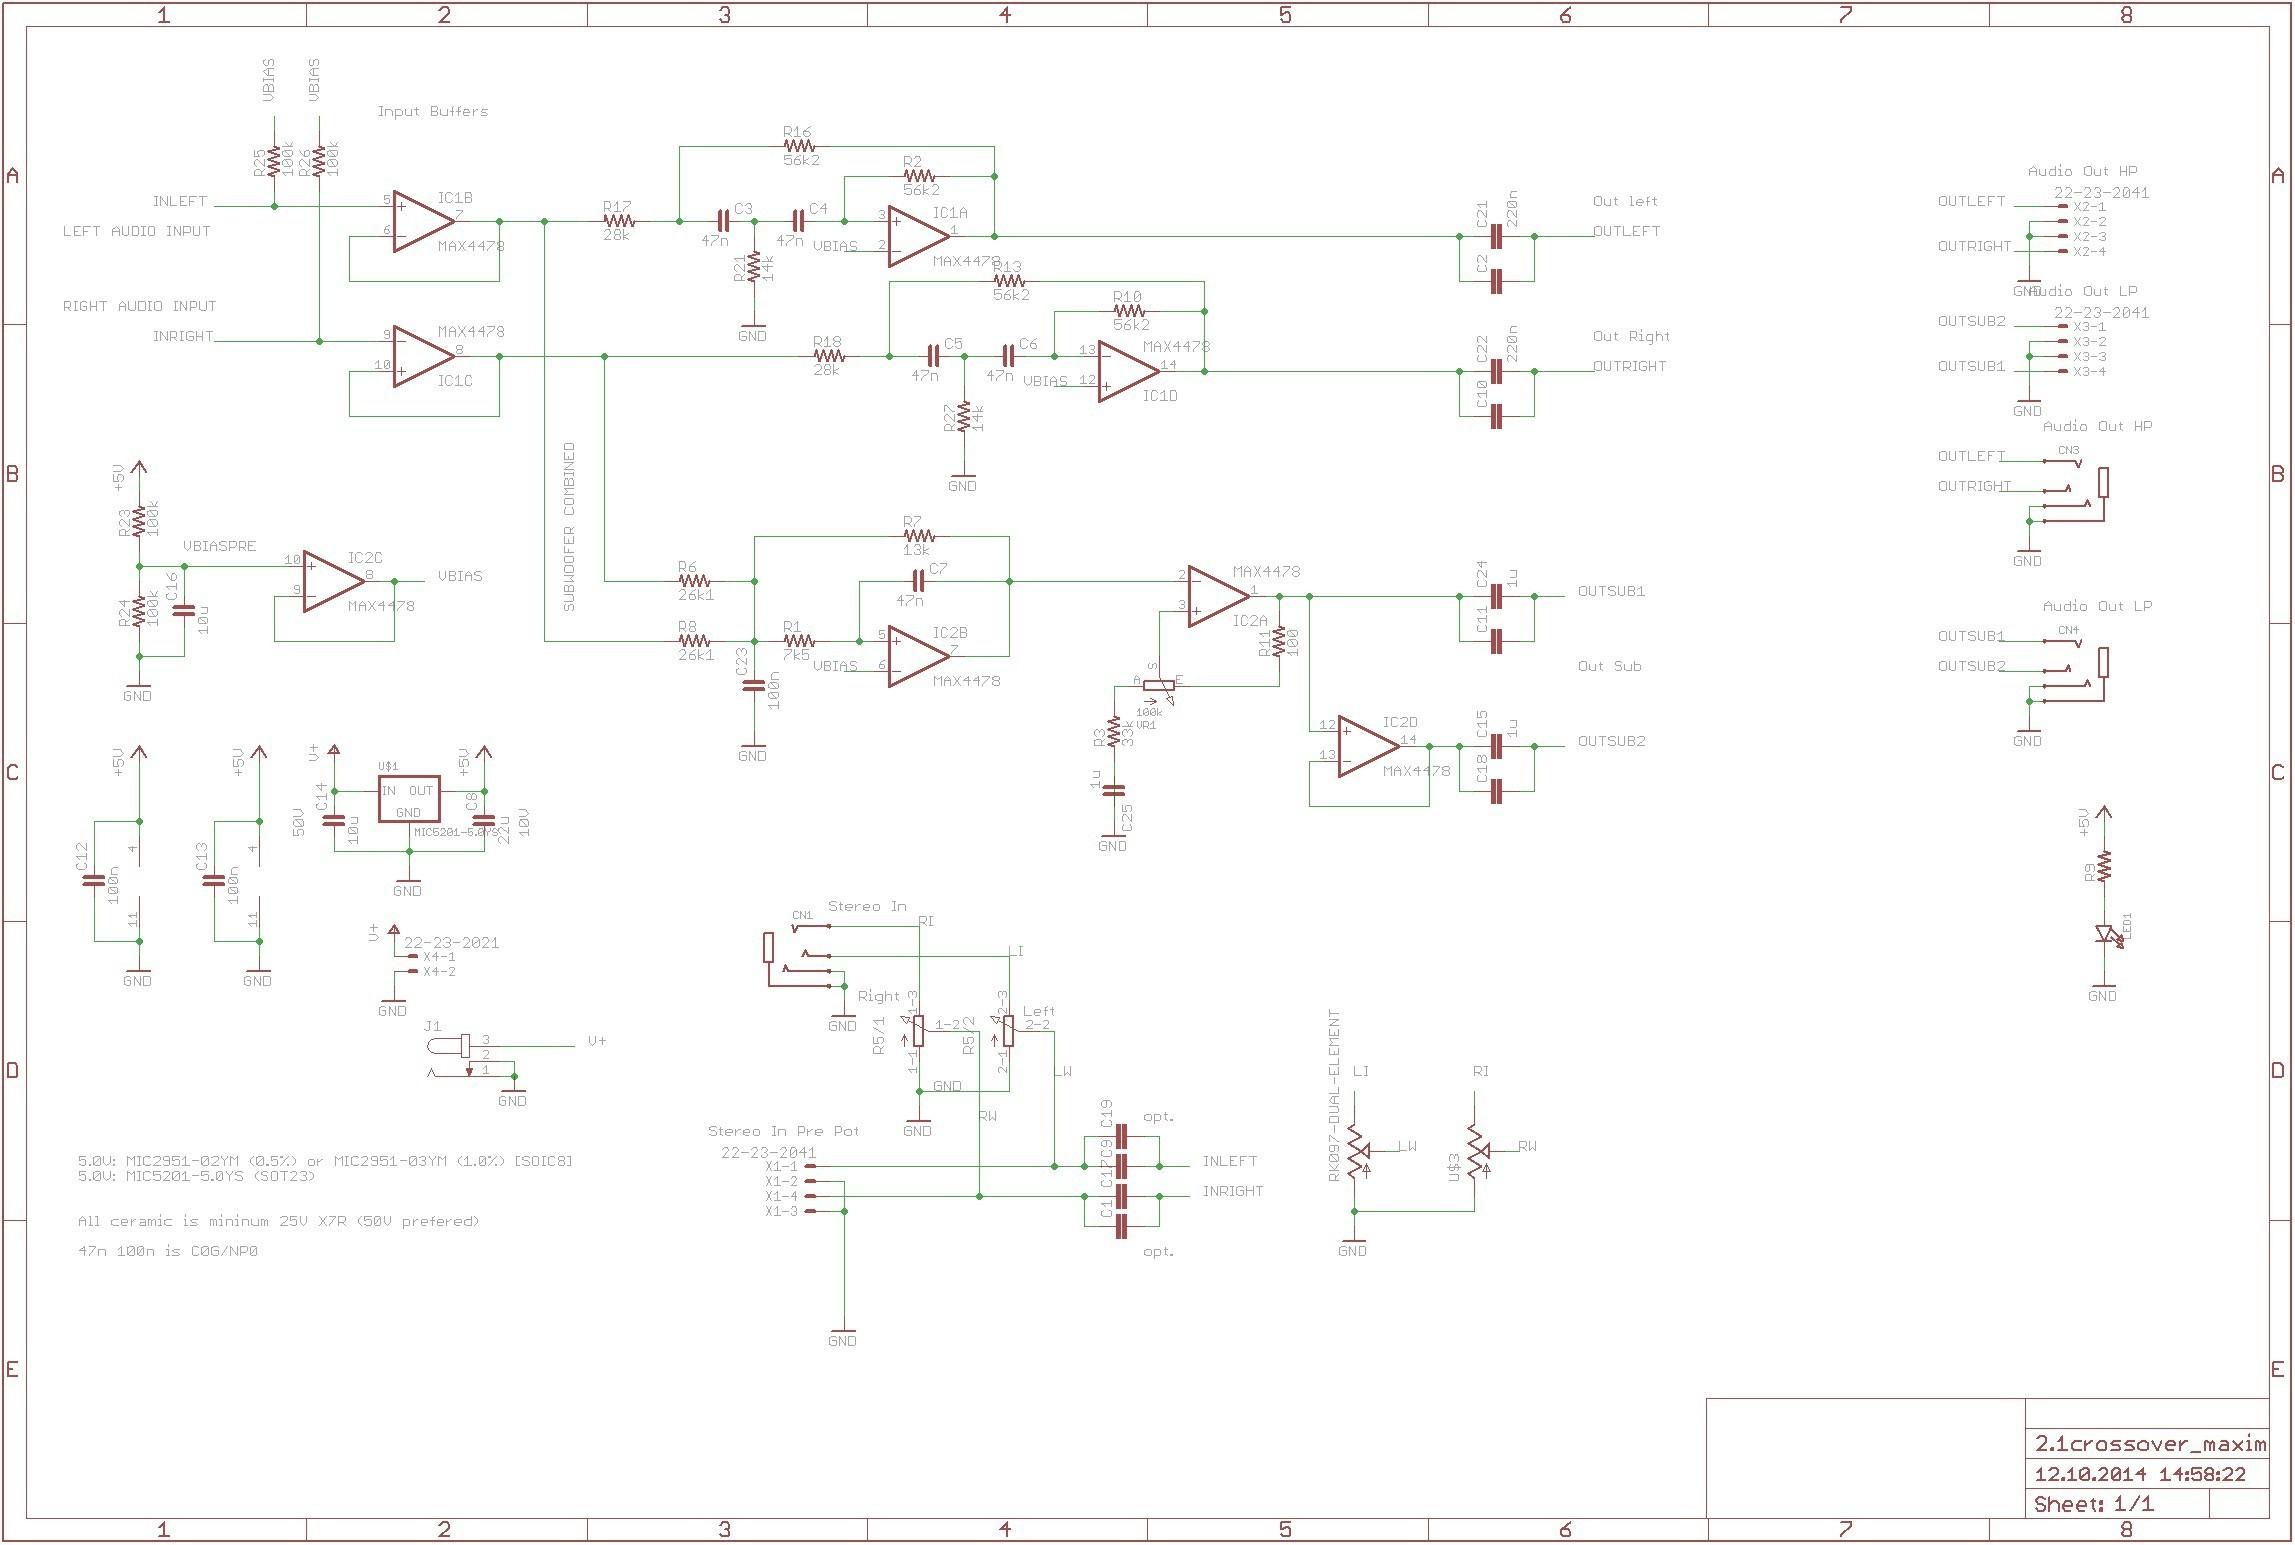 wiring lights in parallel Download Aktive Crossoverfrequenzweiche Mit Max4478 360customs Crossover Schematic Rev 0d wiring